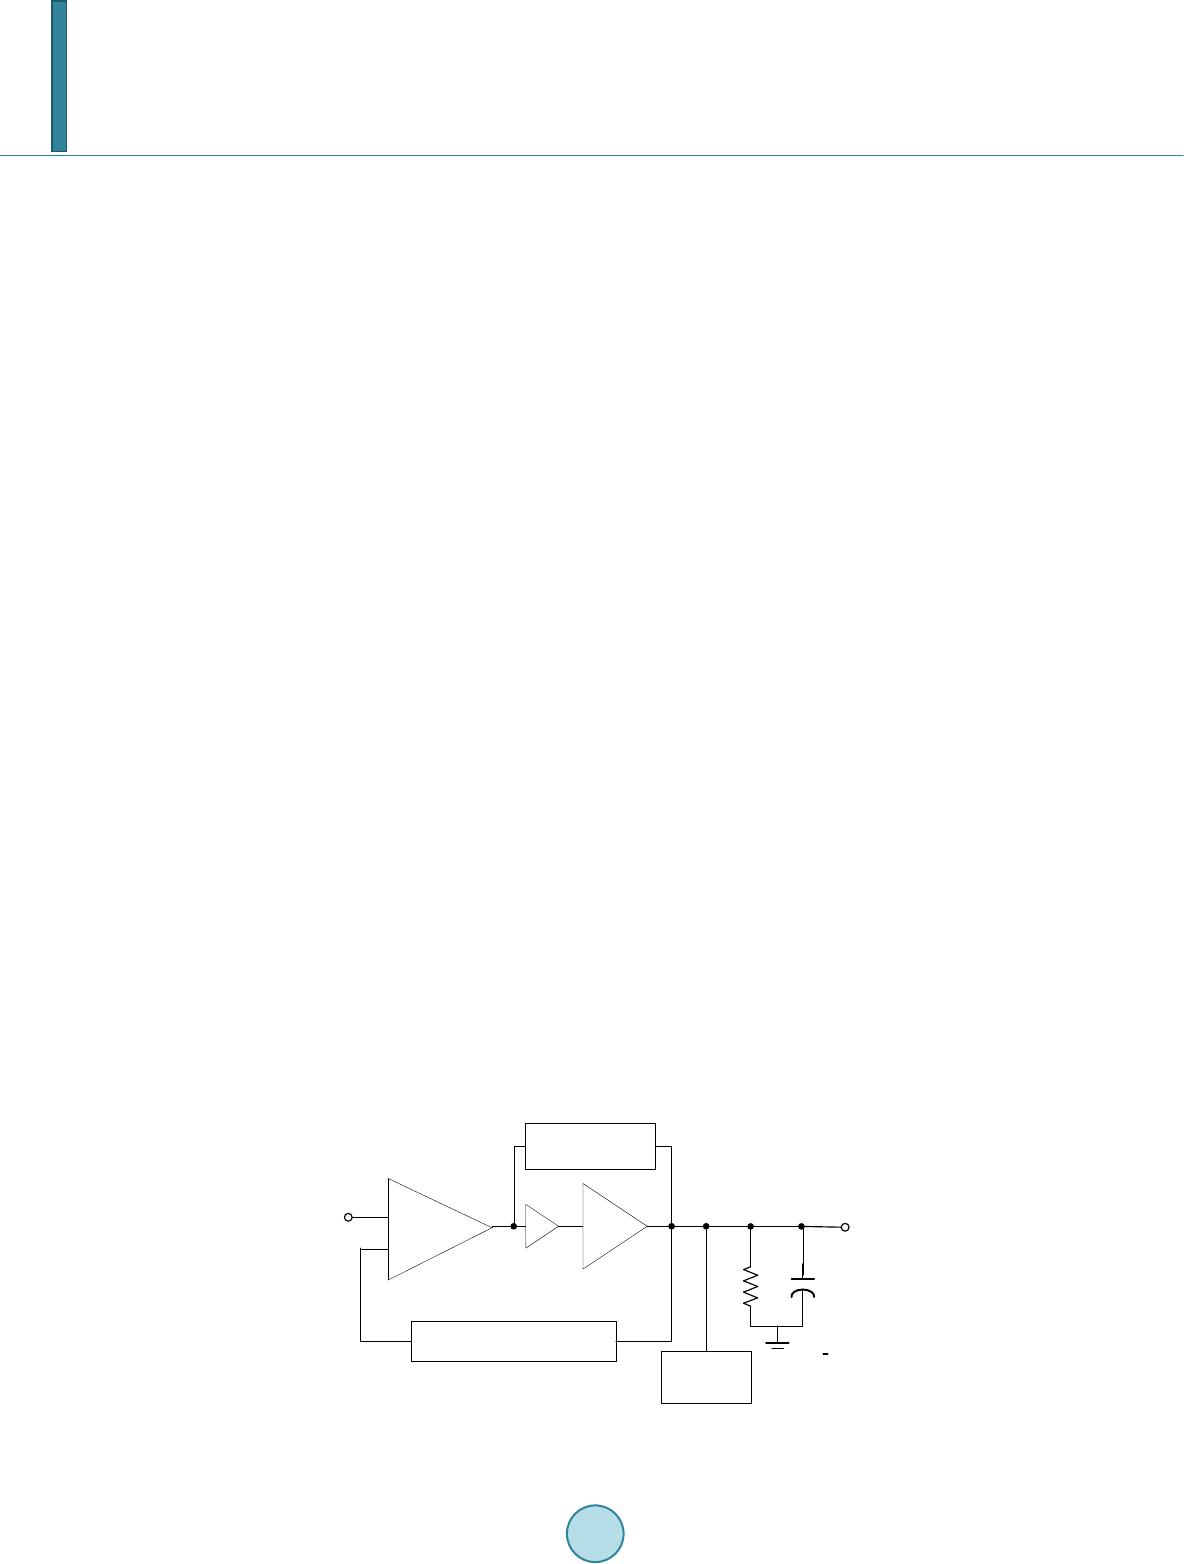 An Ultra Low Quiescent Current Cmos Dropout Regulator With Small 20 V 300 Ma Noise Ldo L J Du Et Al